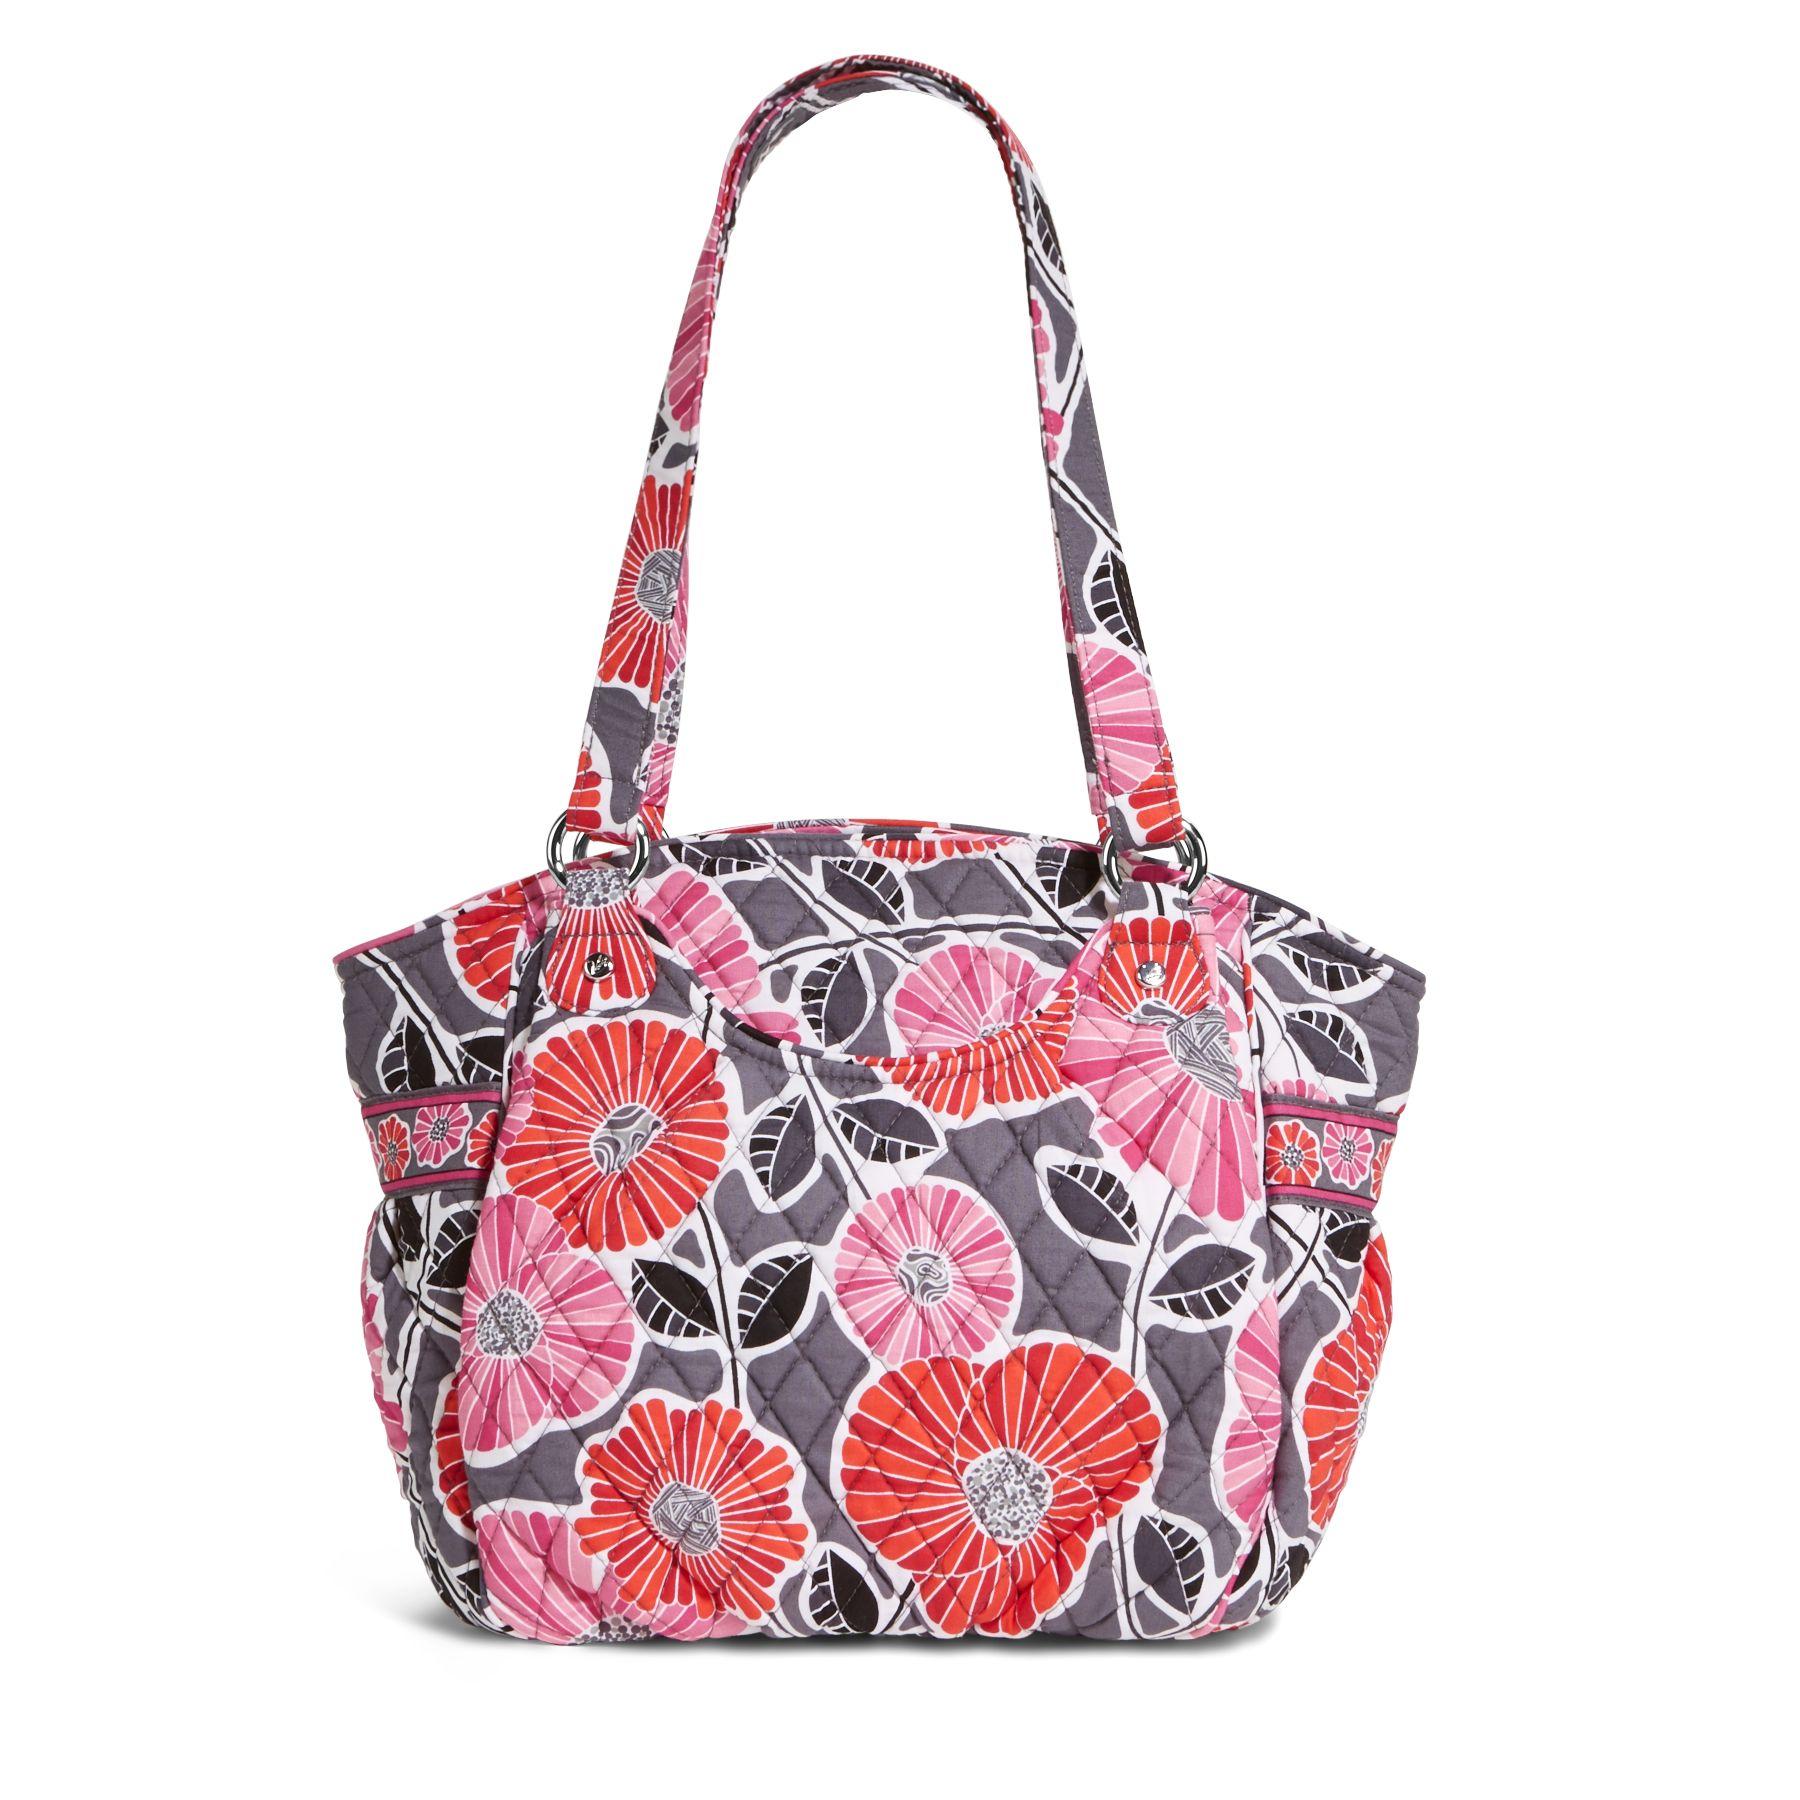 Vera Bradley Glenna Shoulder Bag in Cheery Blossoms